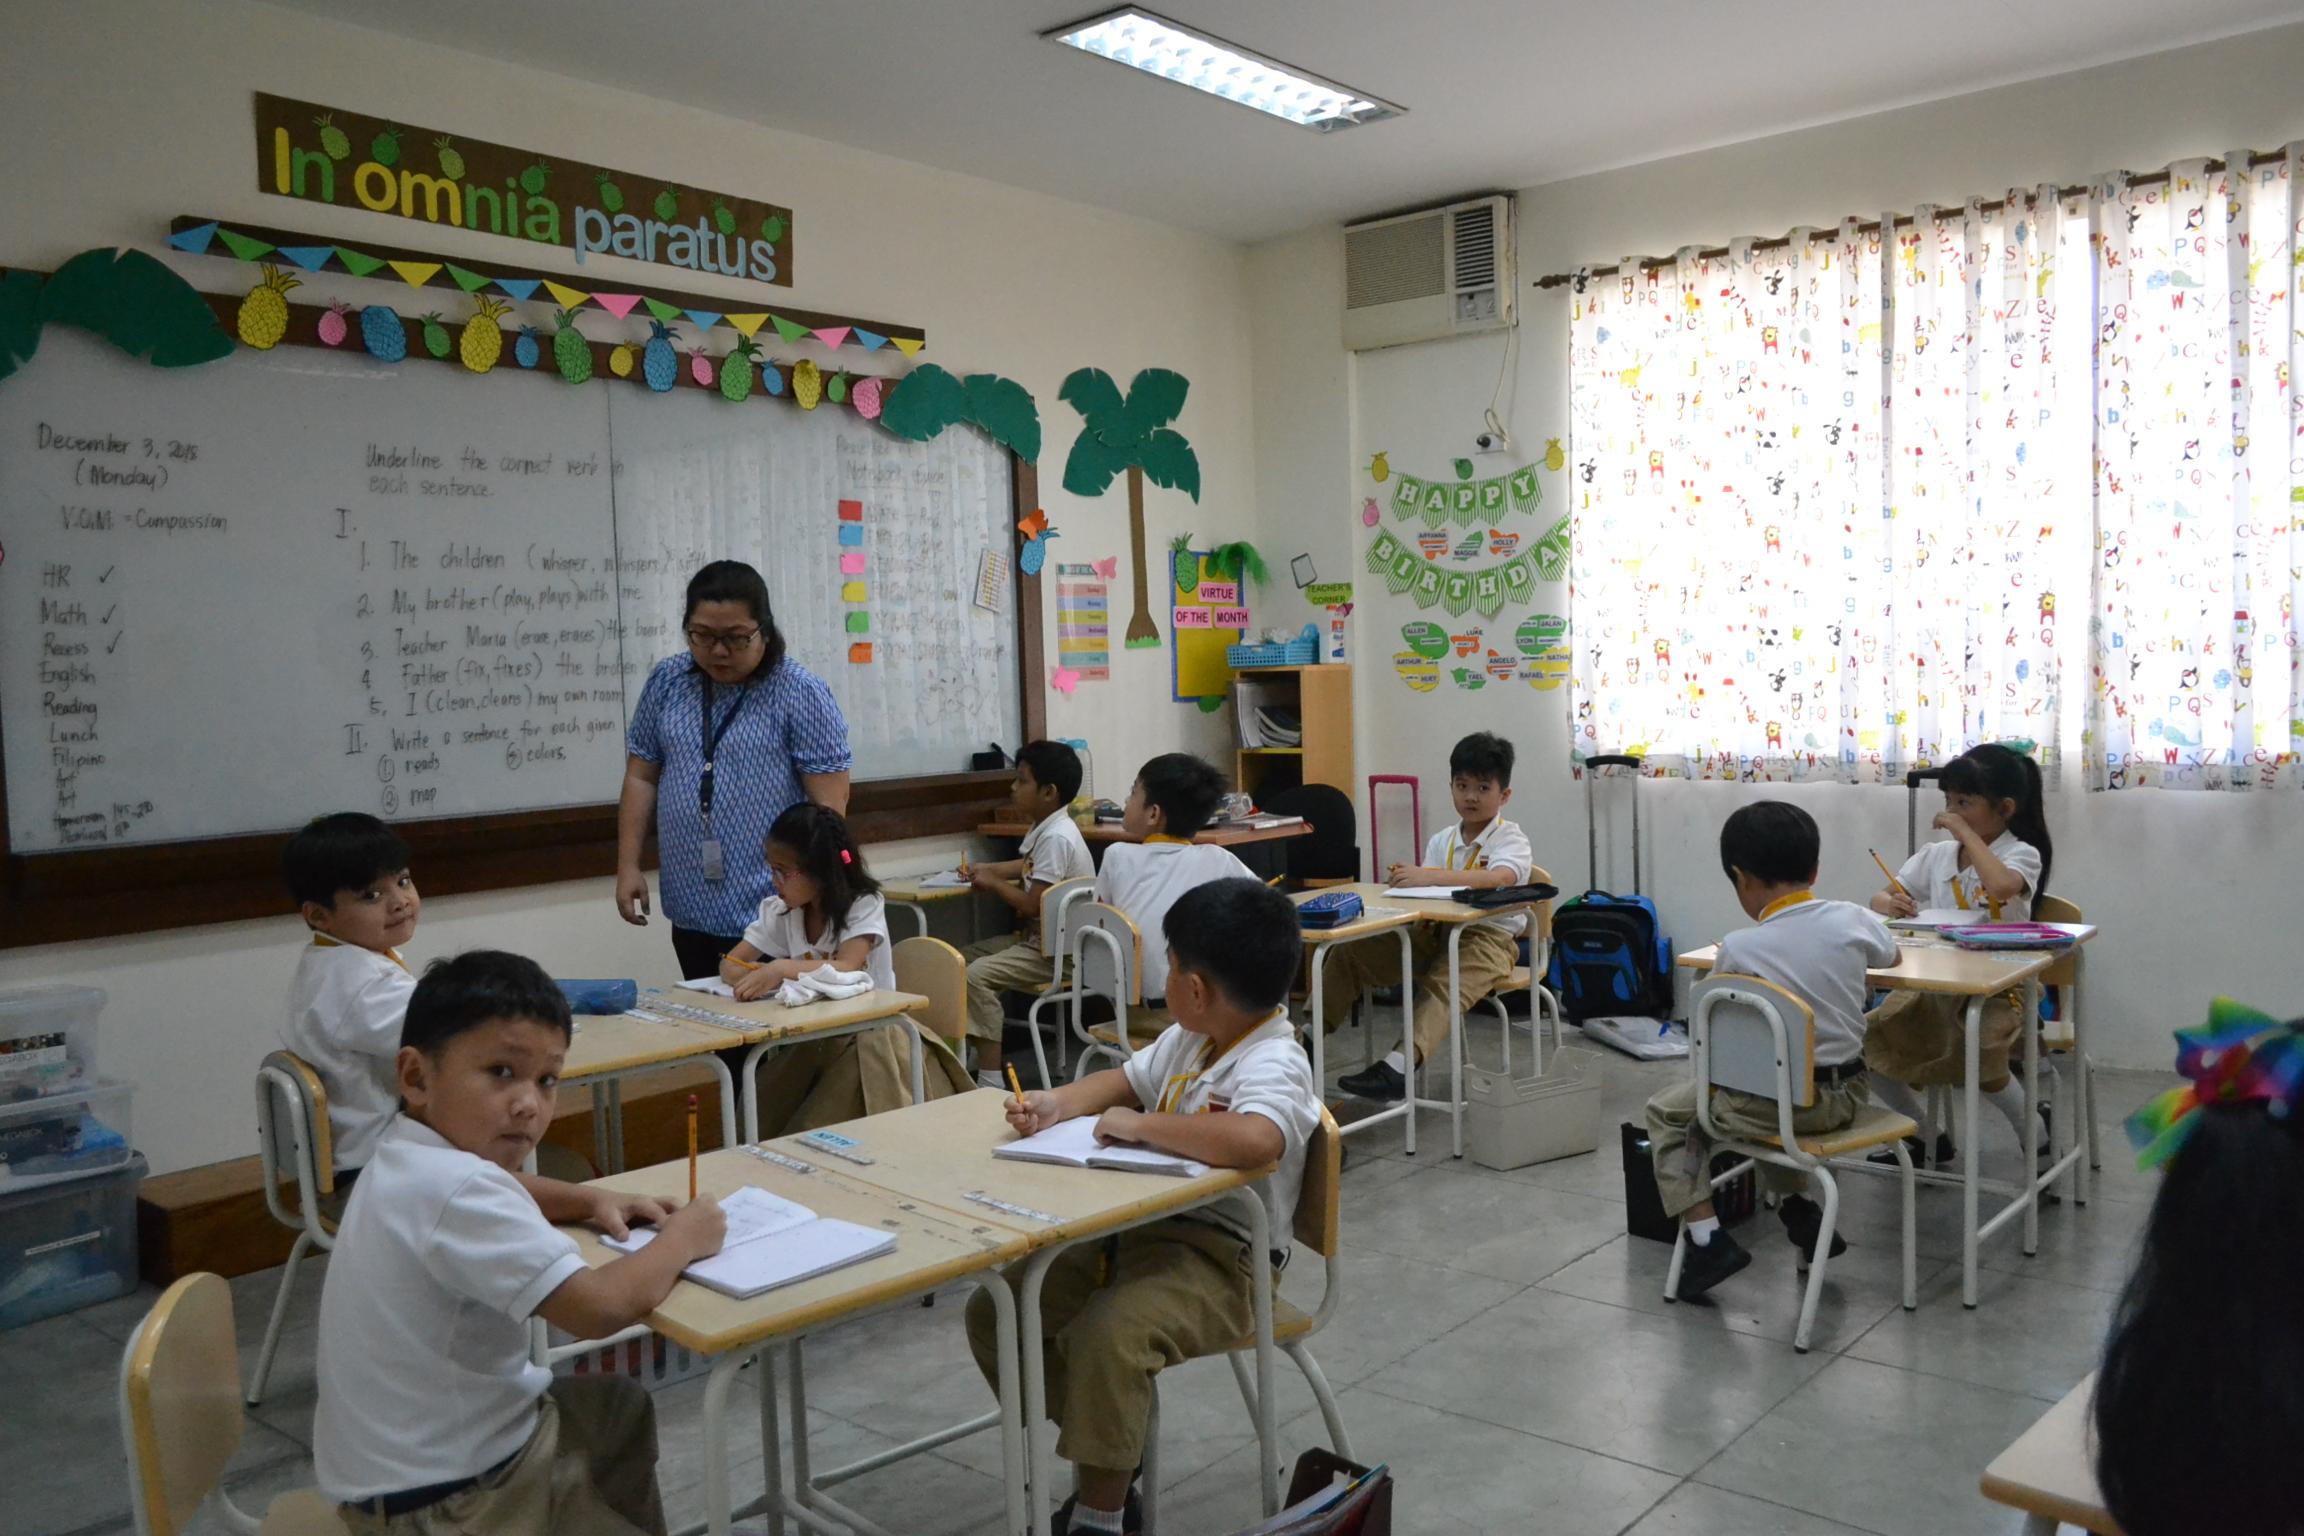 Grade School Classrooms Photo